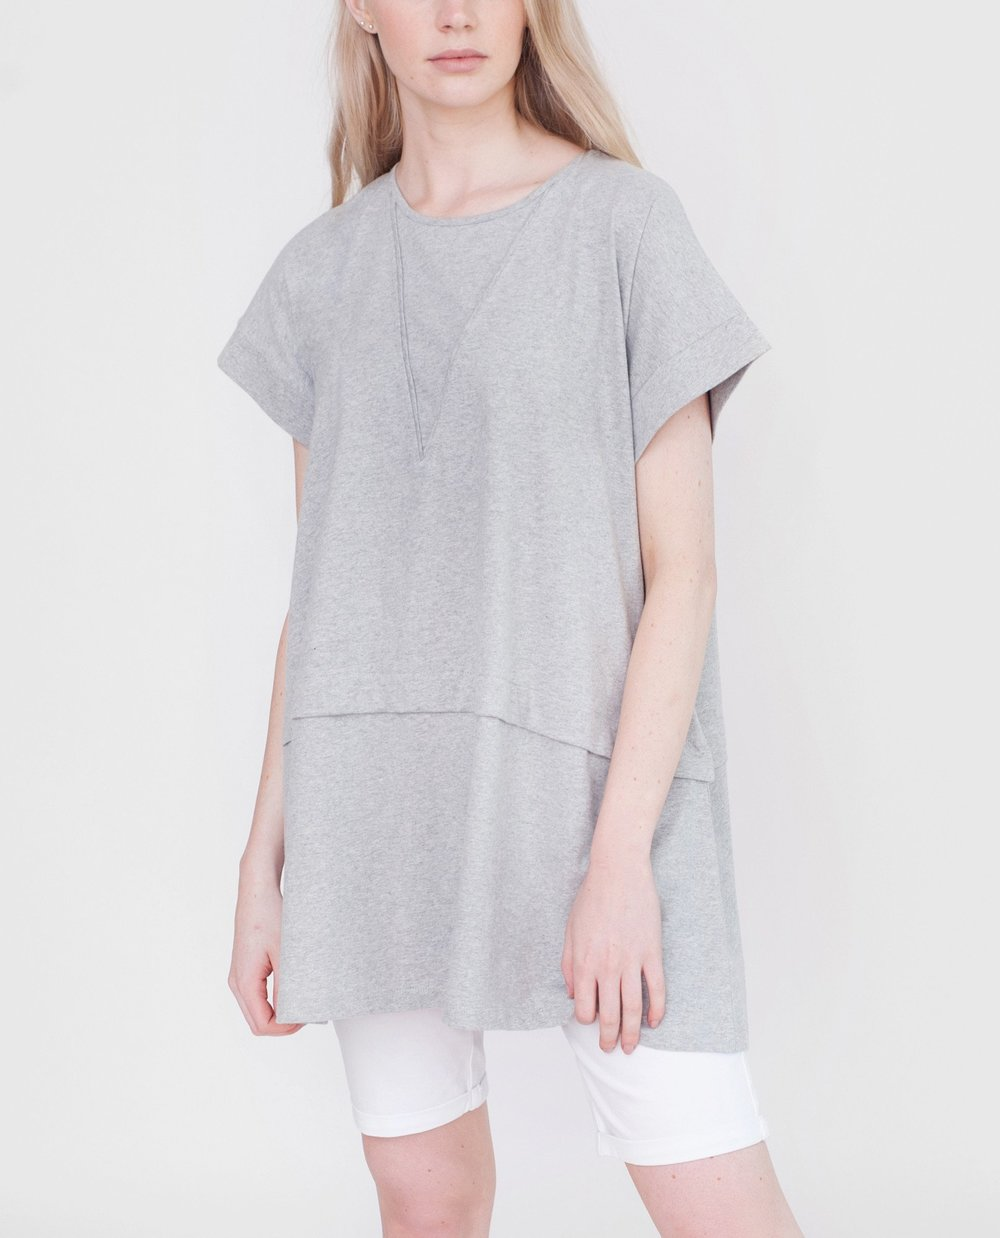 Riley-Beaumont-Organic-Organic-Cotton-Tunic-Top-In-Light-Grey-1.jpg